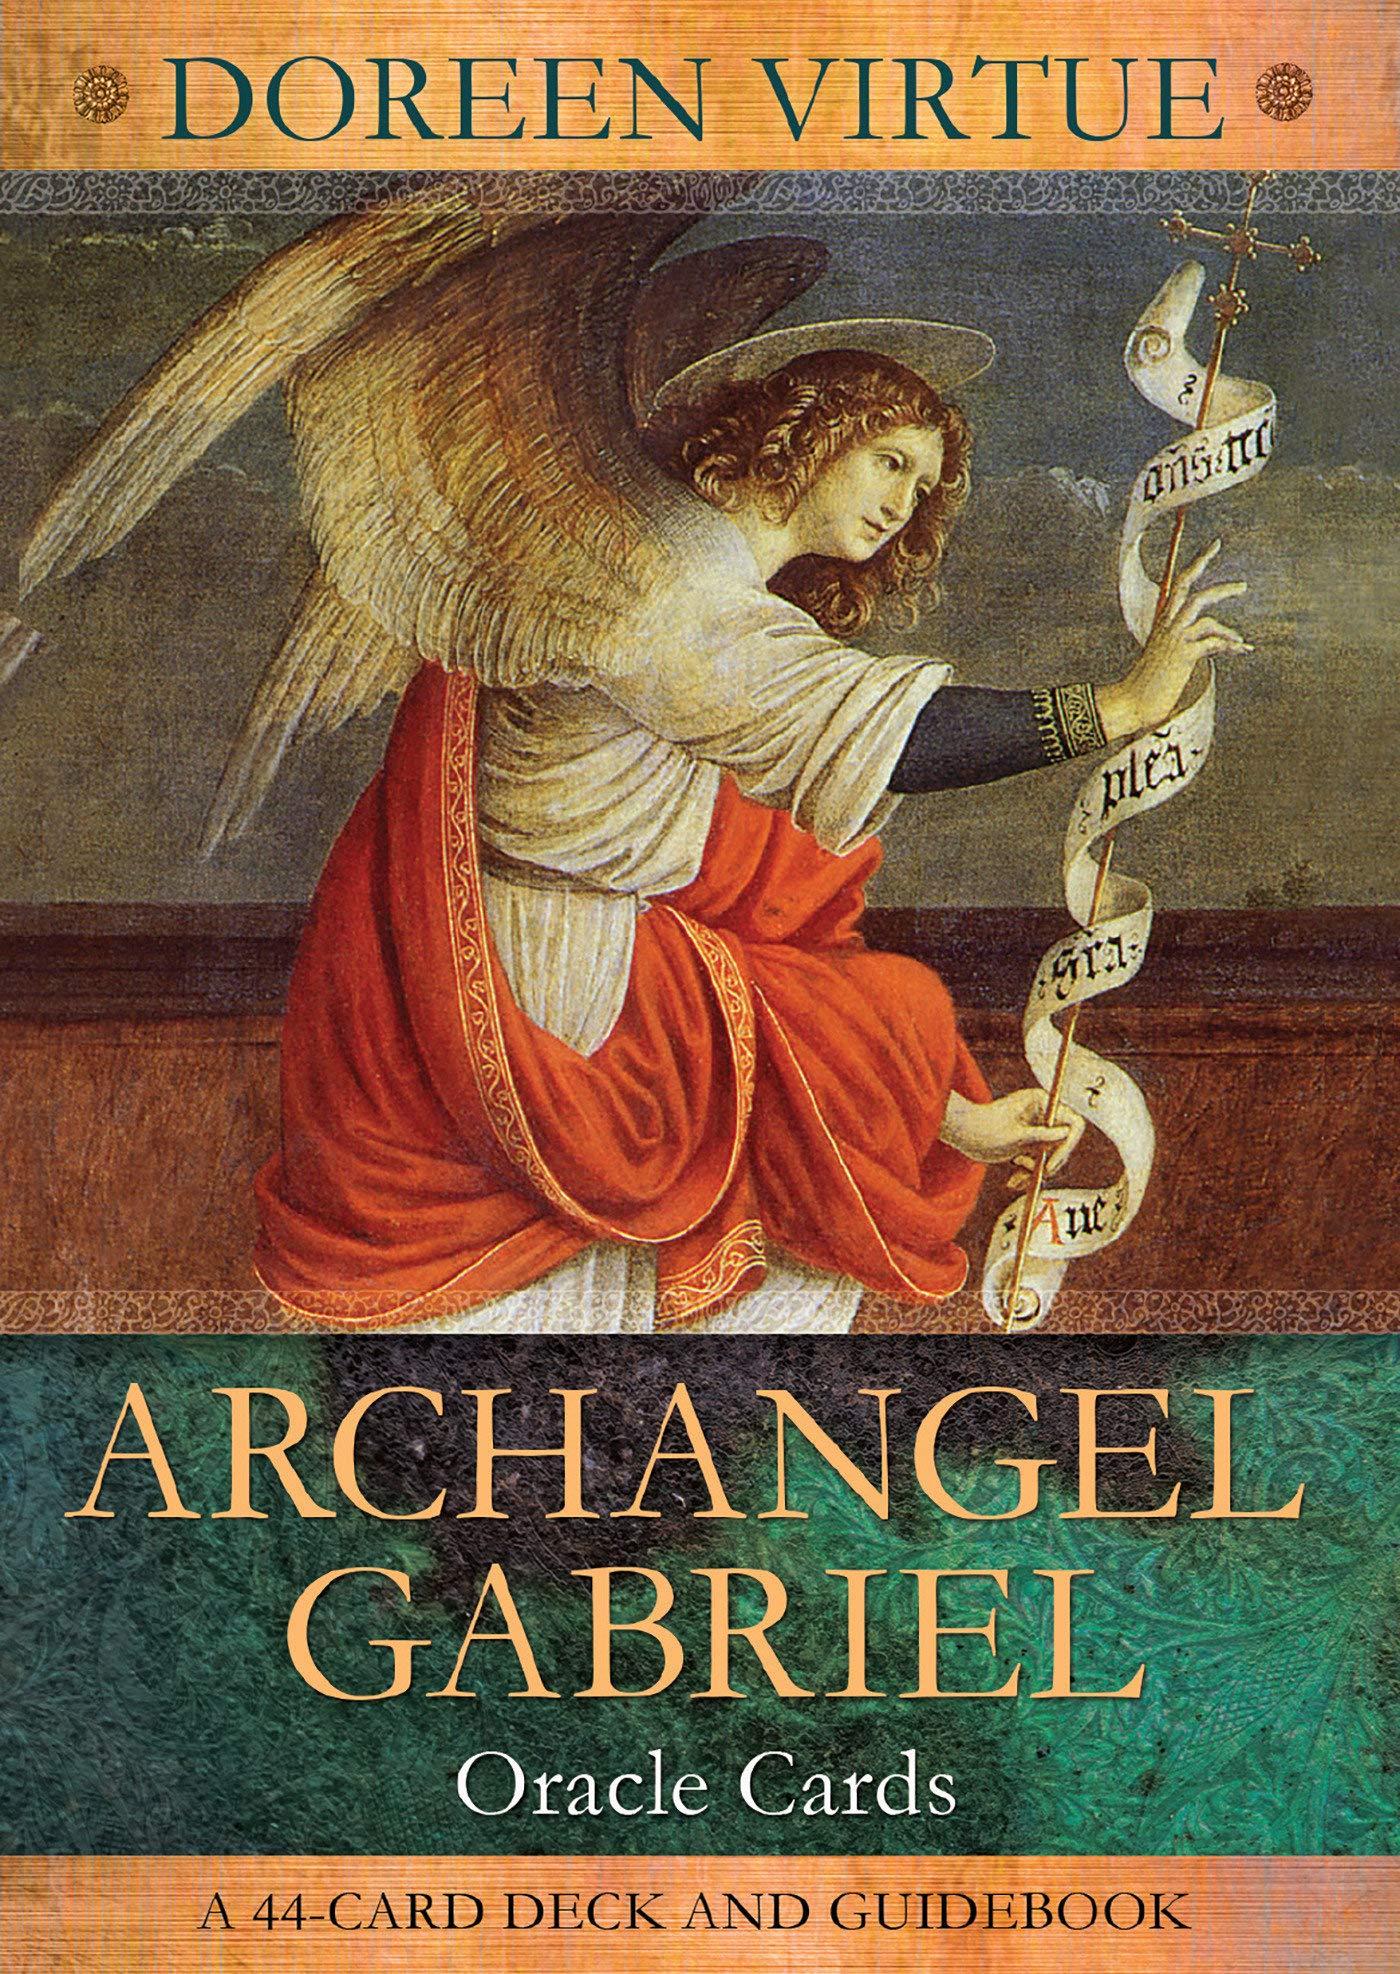 Archangel Gabriel Cards Doreen Virtue product image